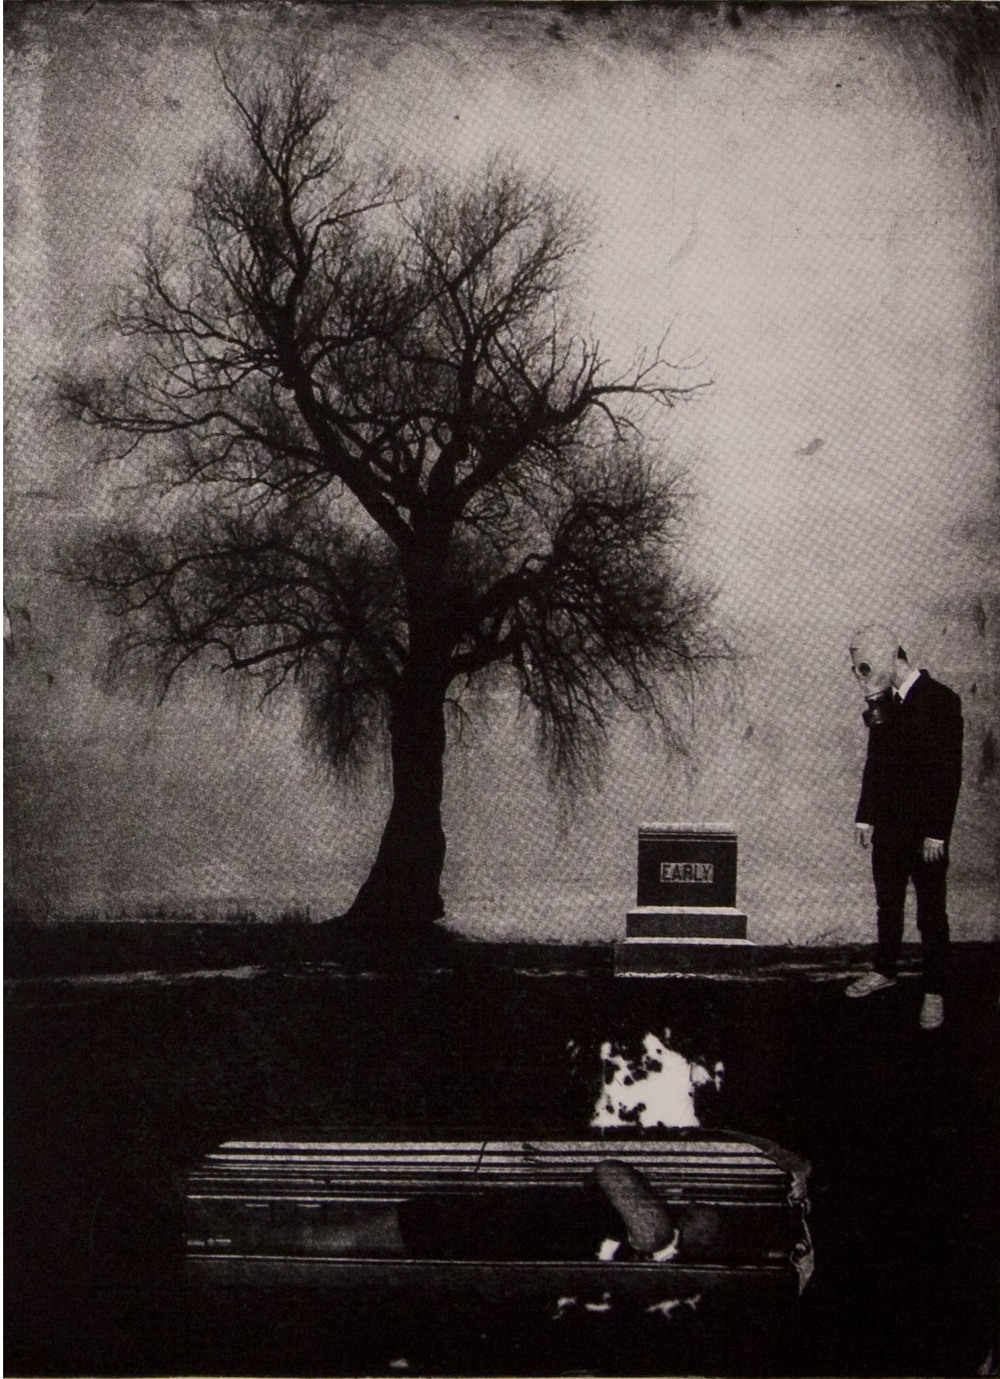 coffin copy.jpg